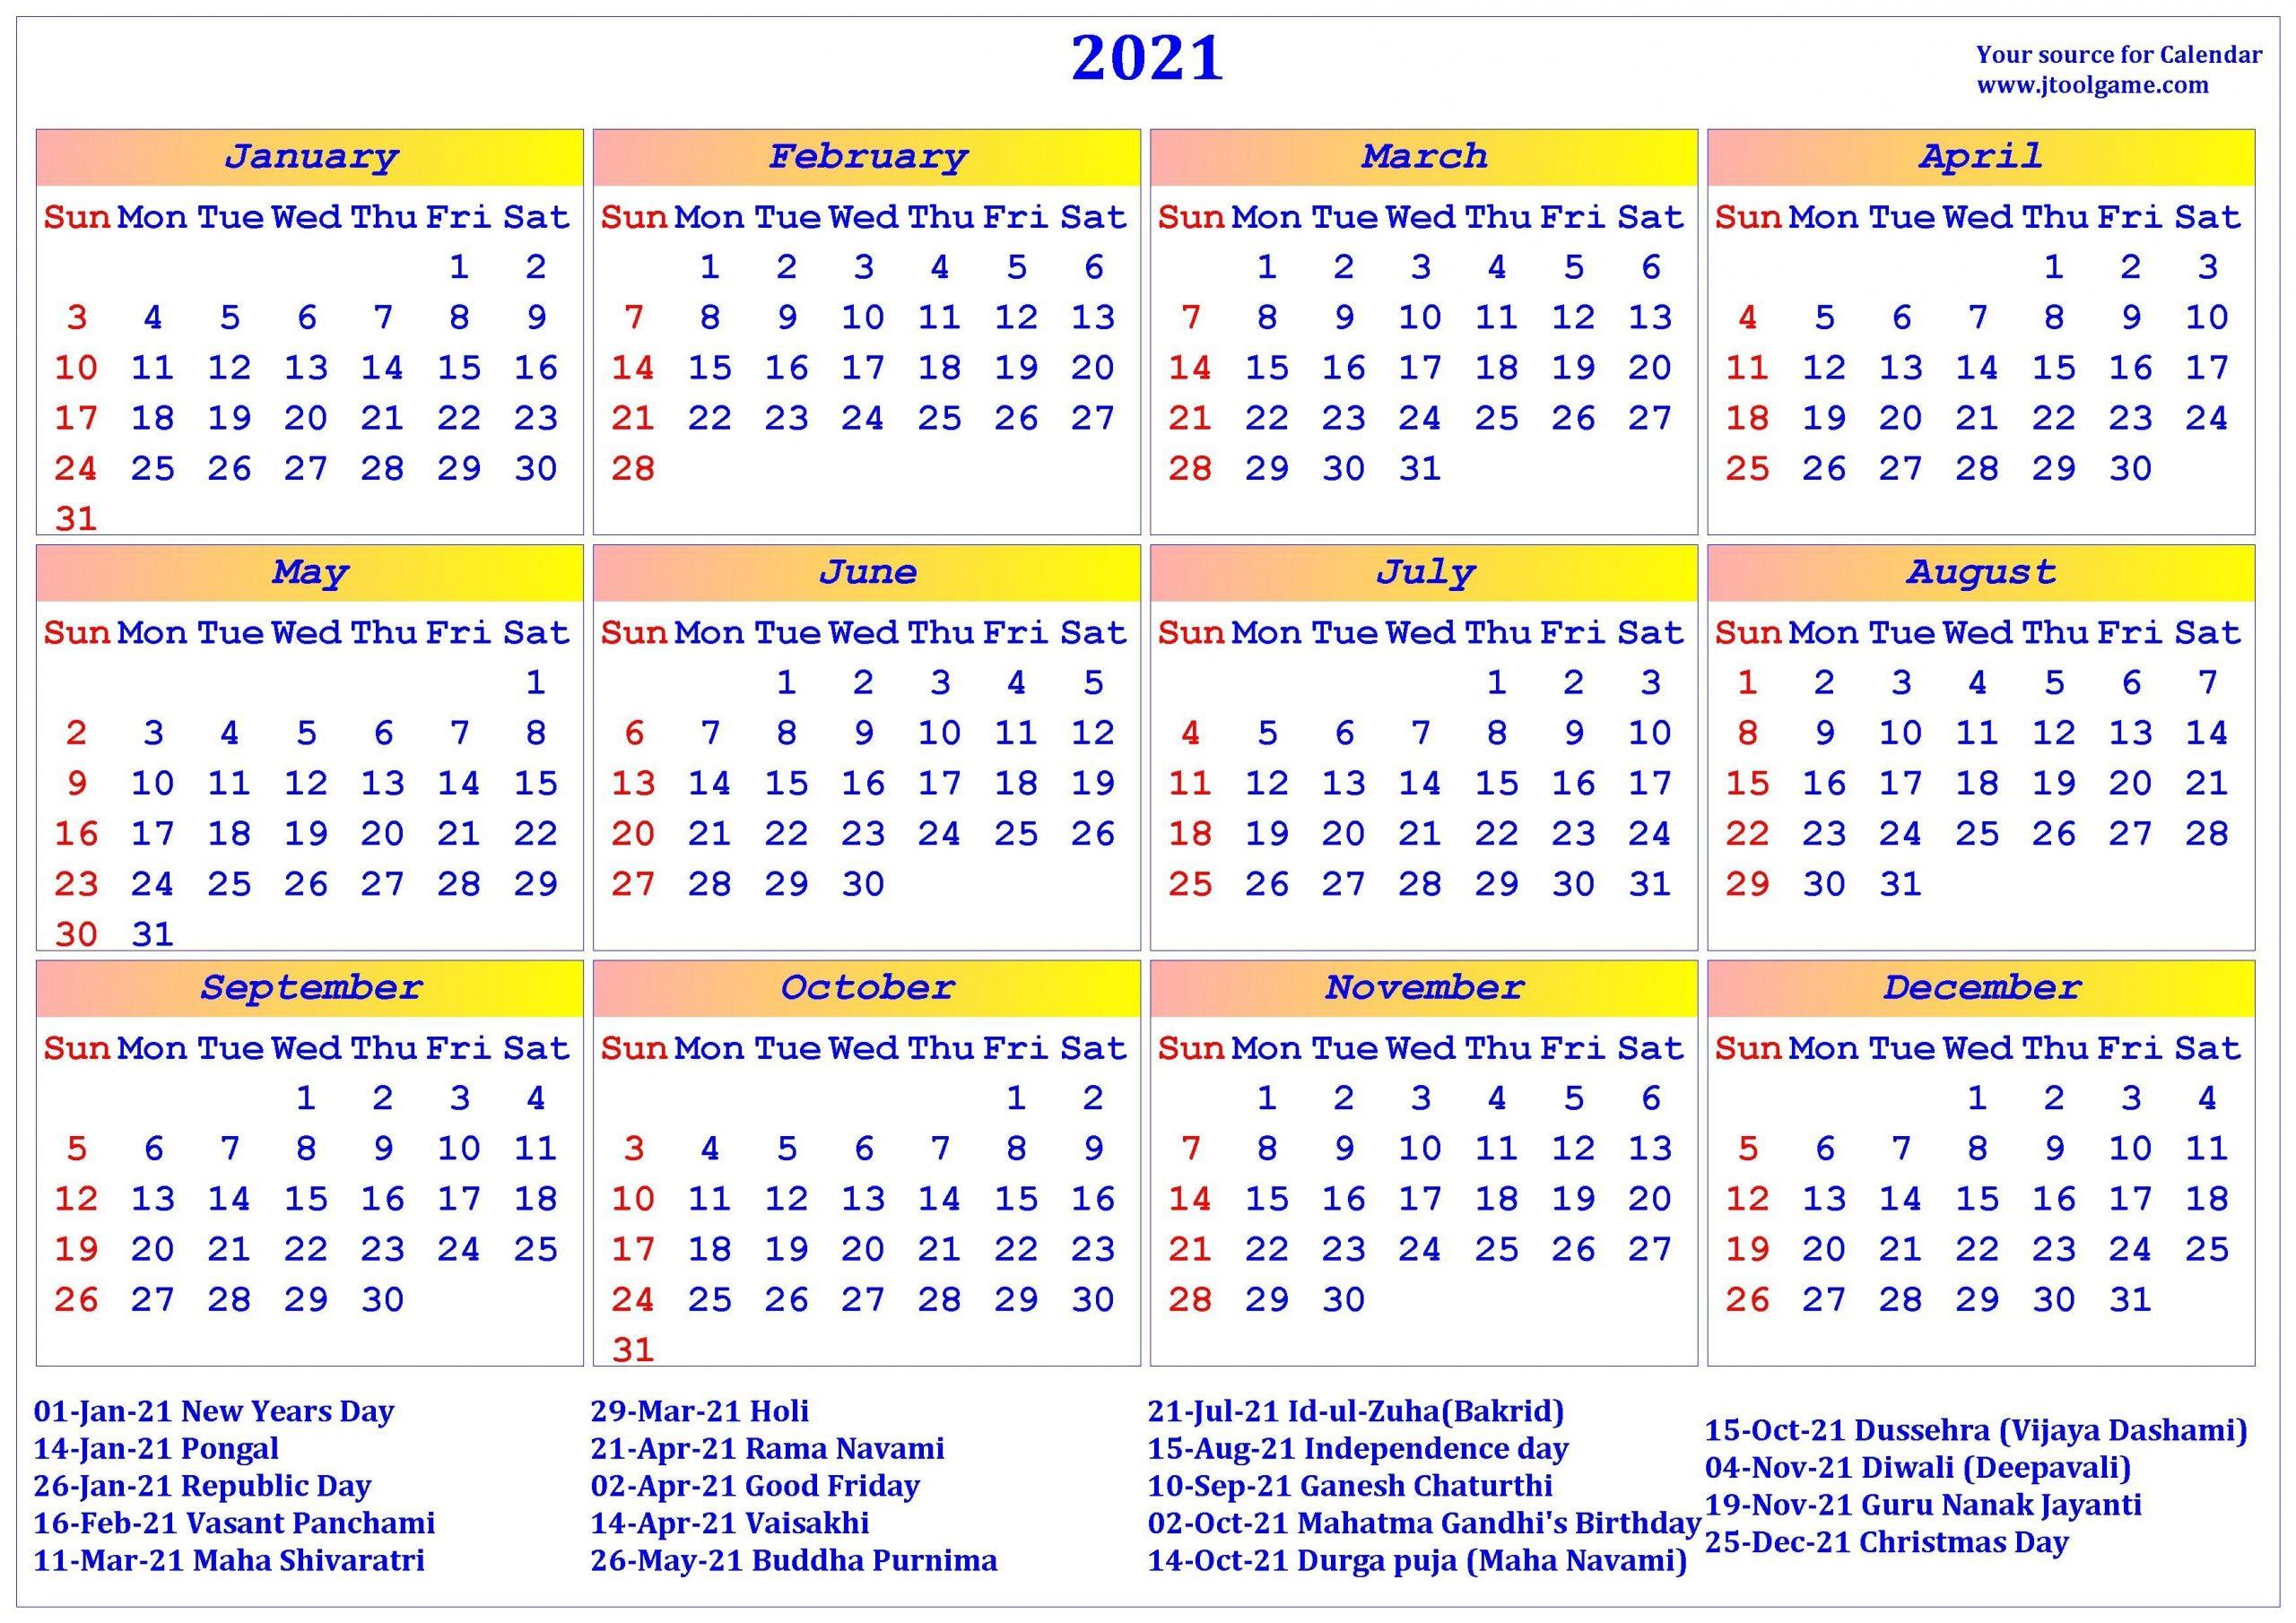 2021 Calendar - Printable Calendar With India Holidays